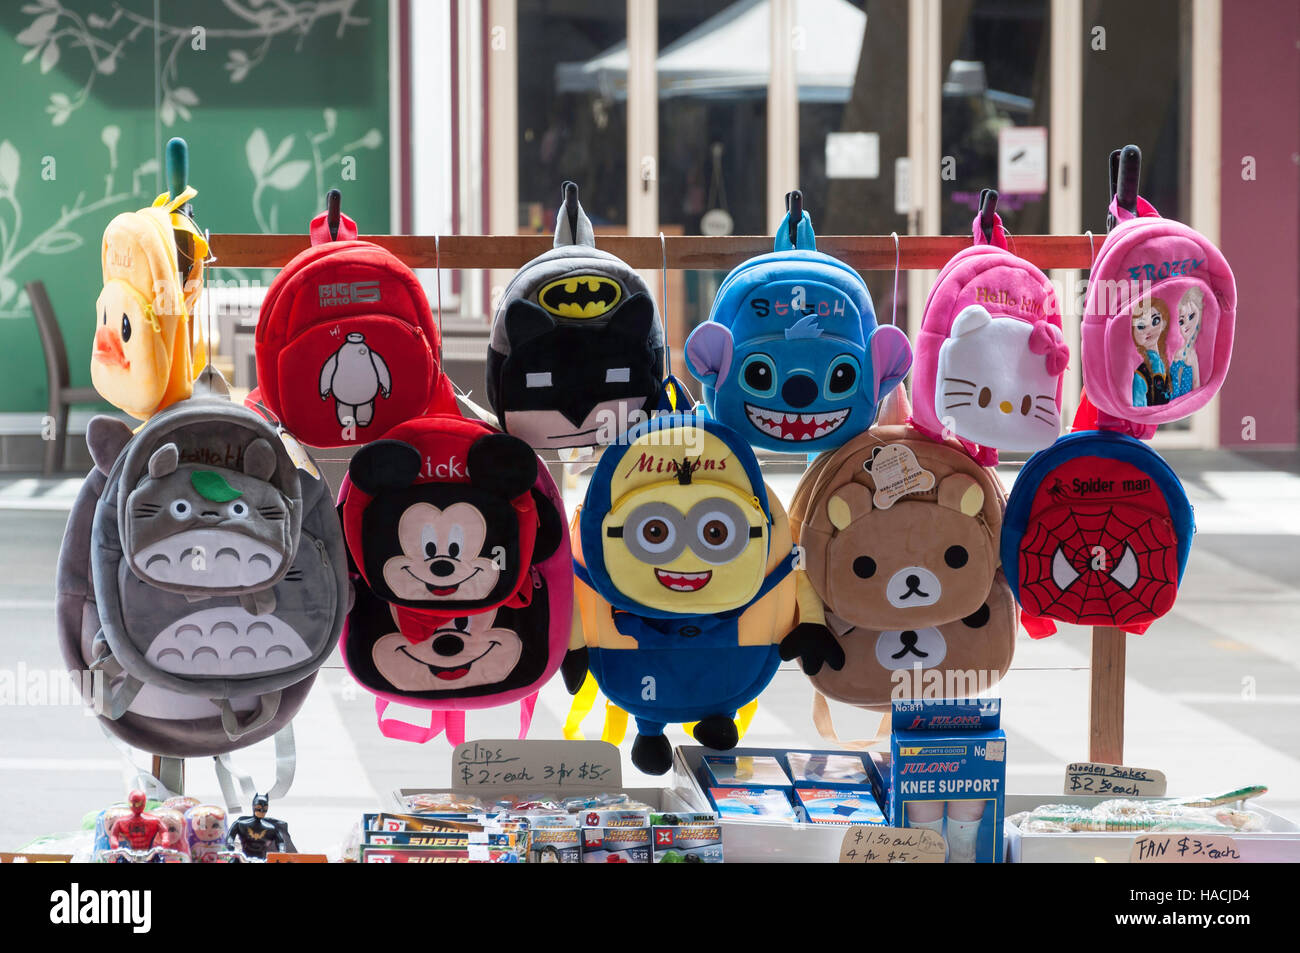 Children's backpacks on market stall, Chinatown Mall, Chinatown, Fortitude Valley, Brisbane, Queensland, Australia - Stock Image